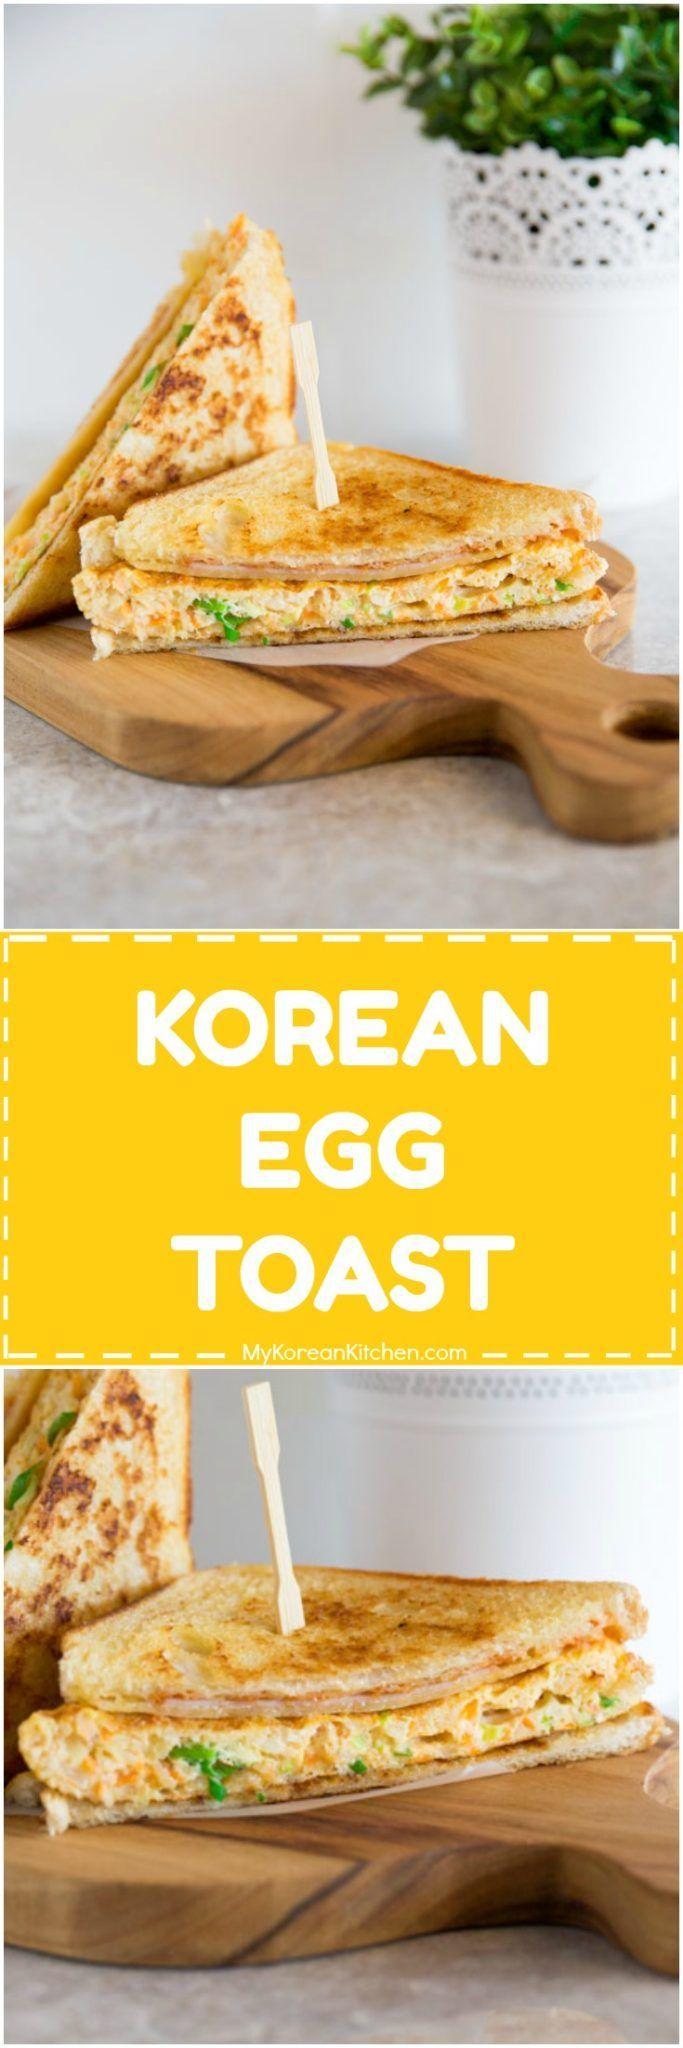 Easy Korean egg toast. Perfect for on the go breakfast or brunch!   MyKoreanKitchen.com  #koreanfood #egg #toast #breakfast #brunch #streetfood via @mykoreankitchen